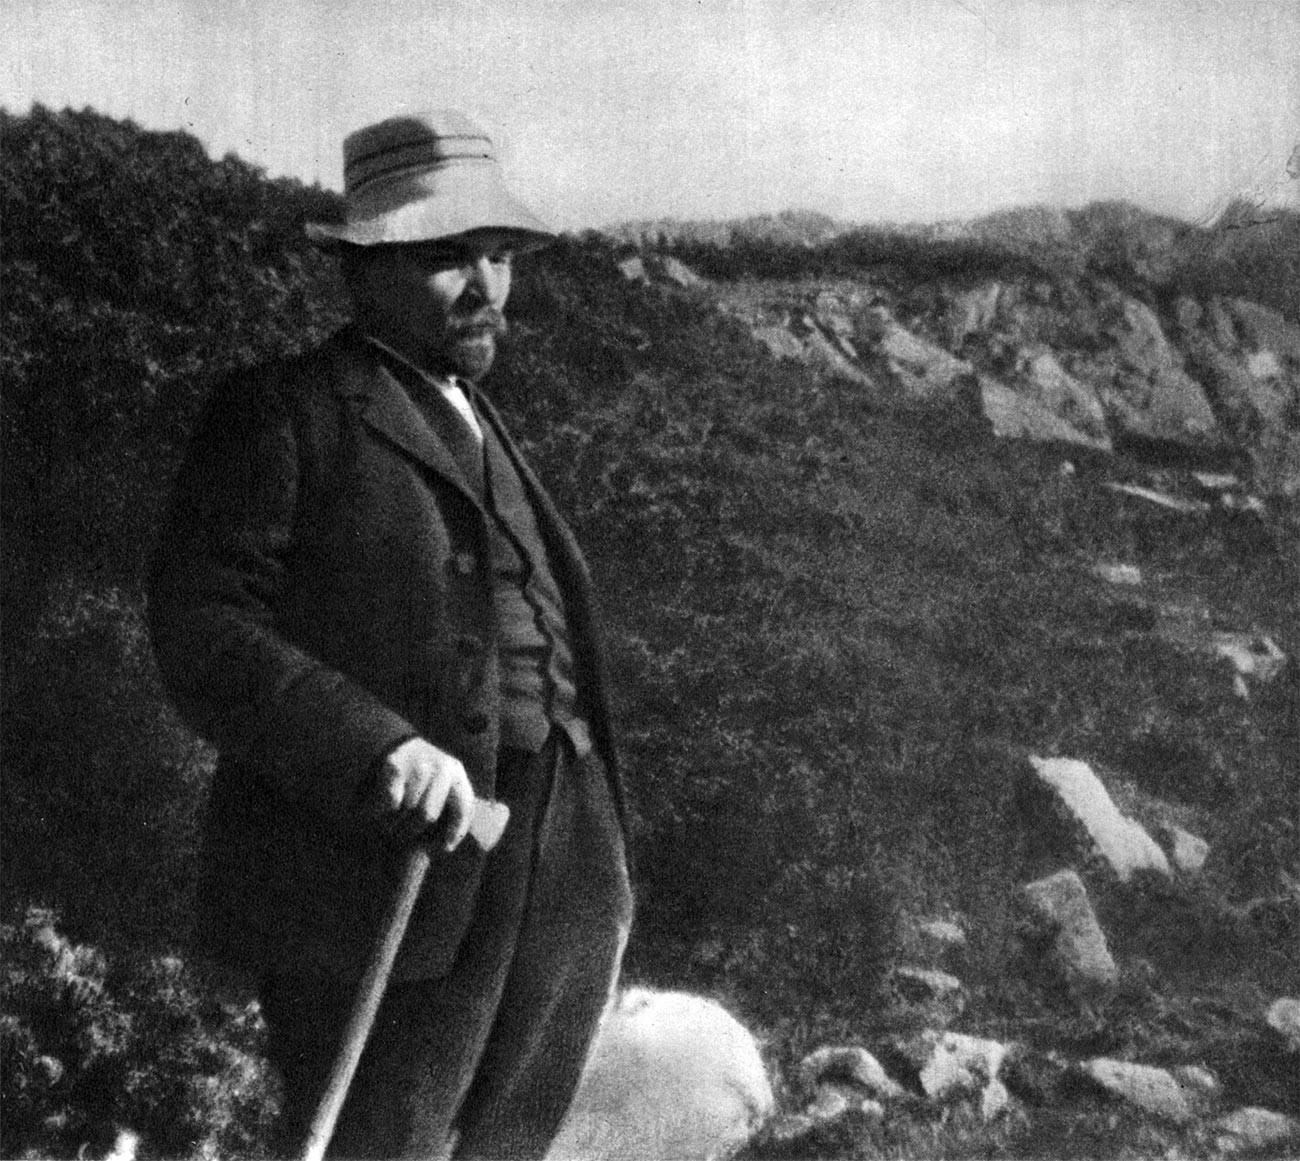 Vladimir Lenin a Zakopane, Polonia, 1914